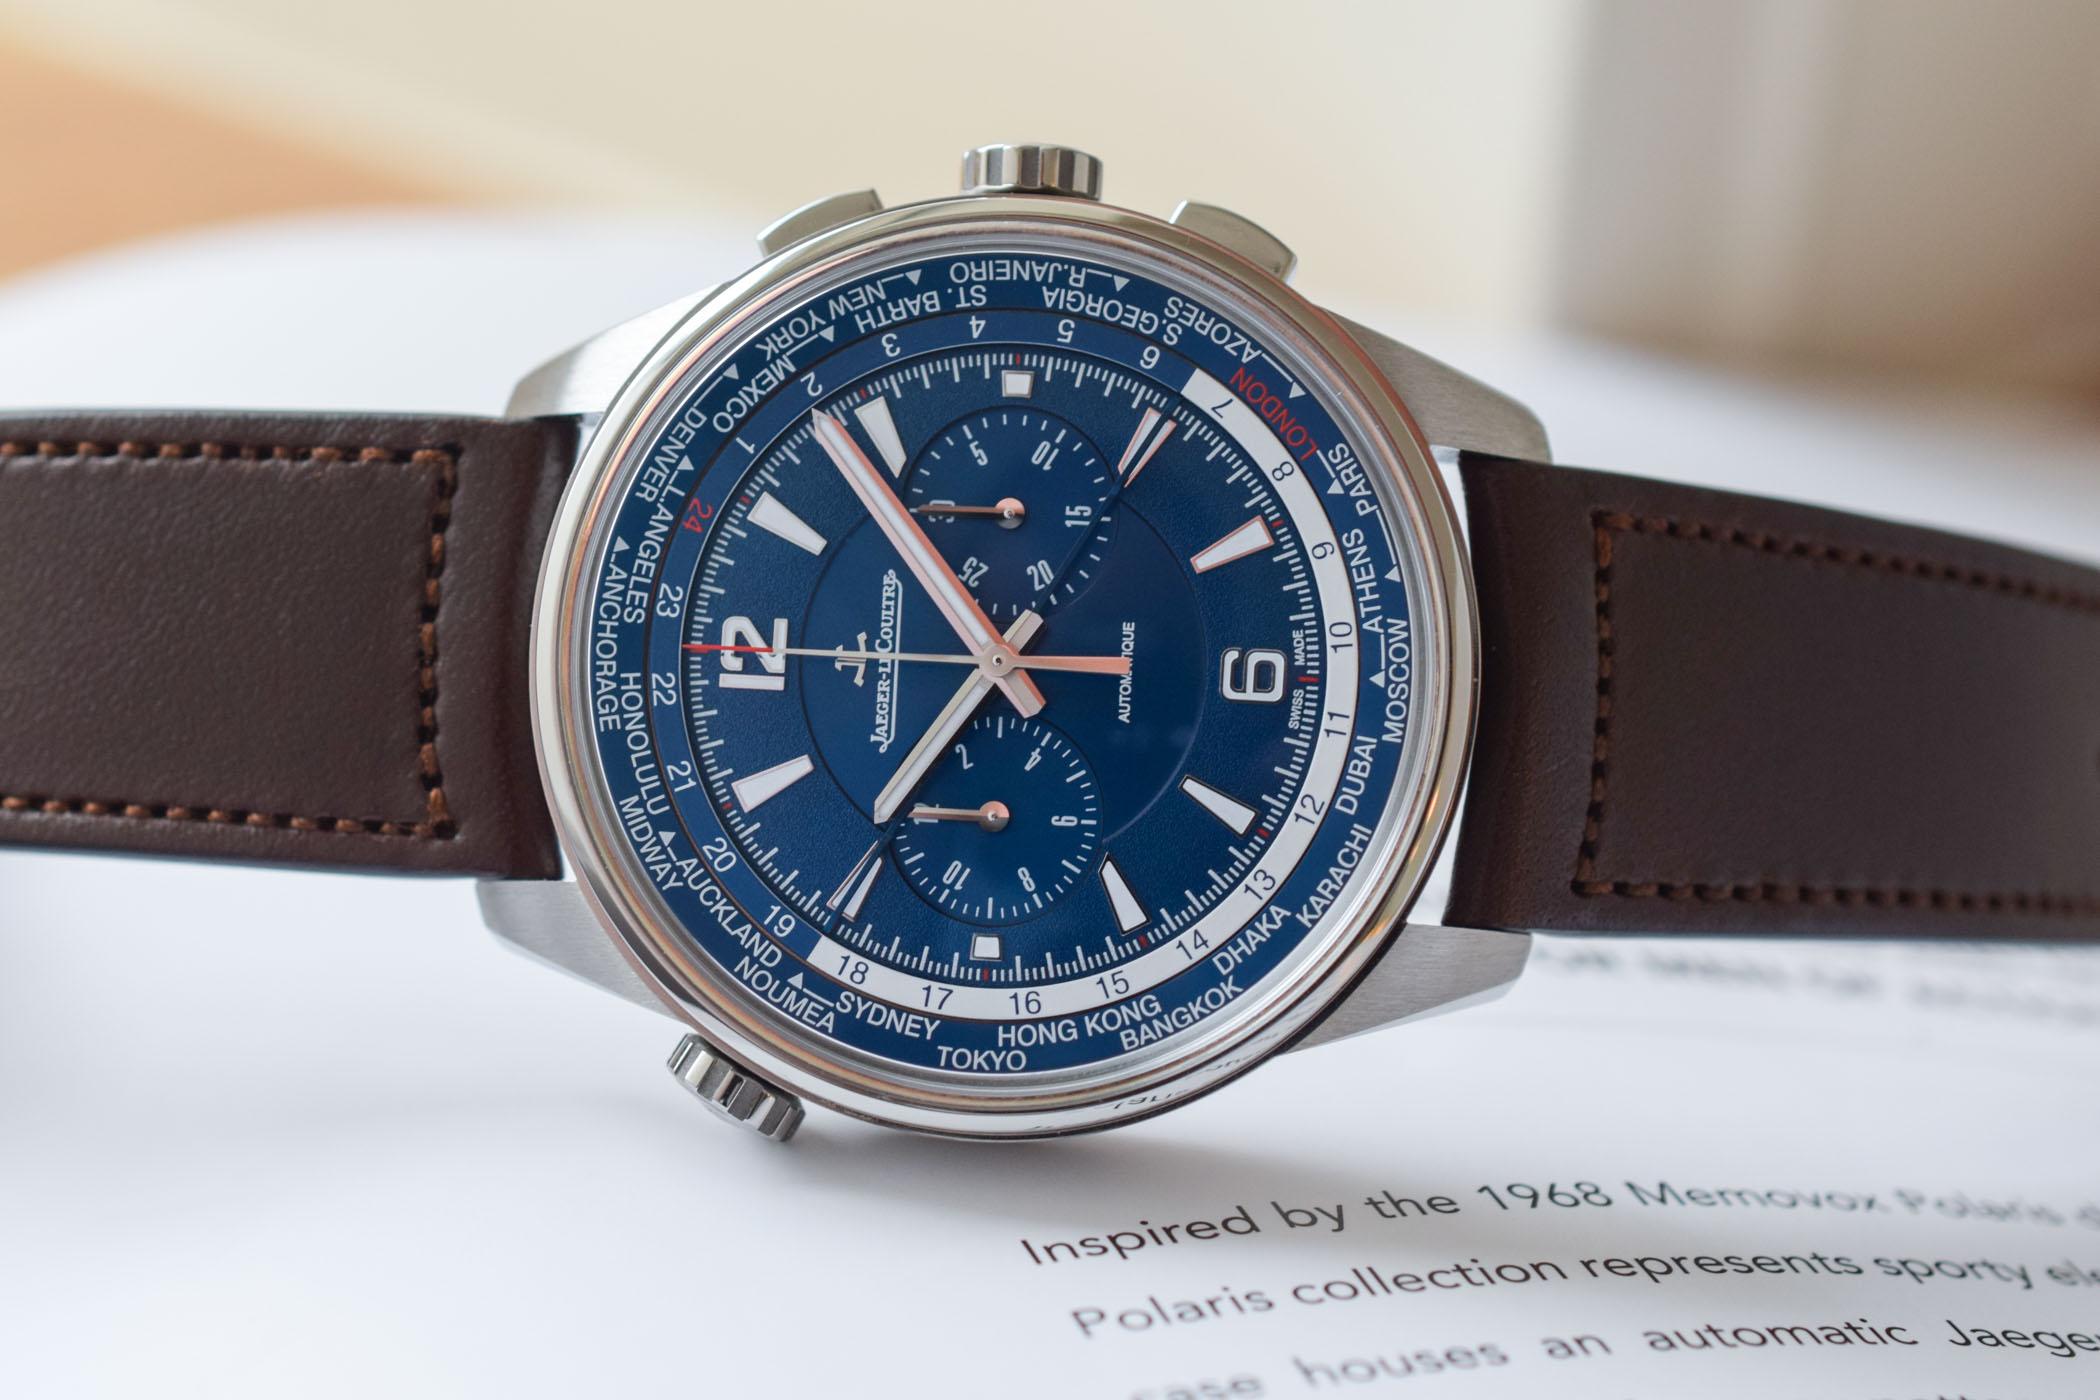 Jaeger-LeCoultre Polaris Chronograph WorldTimer - Review - 11